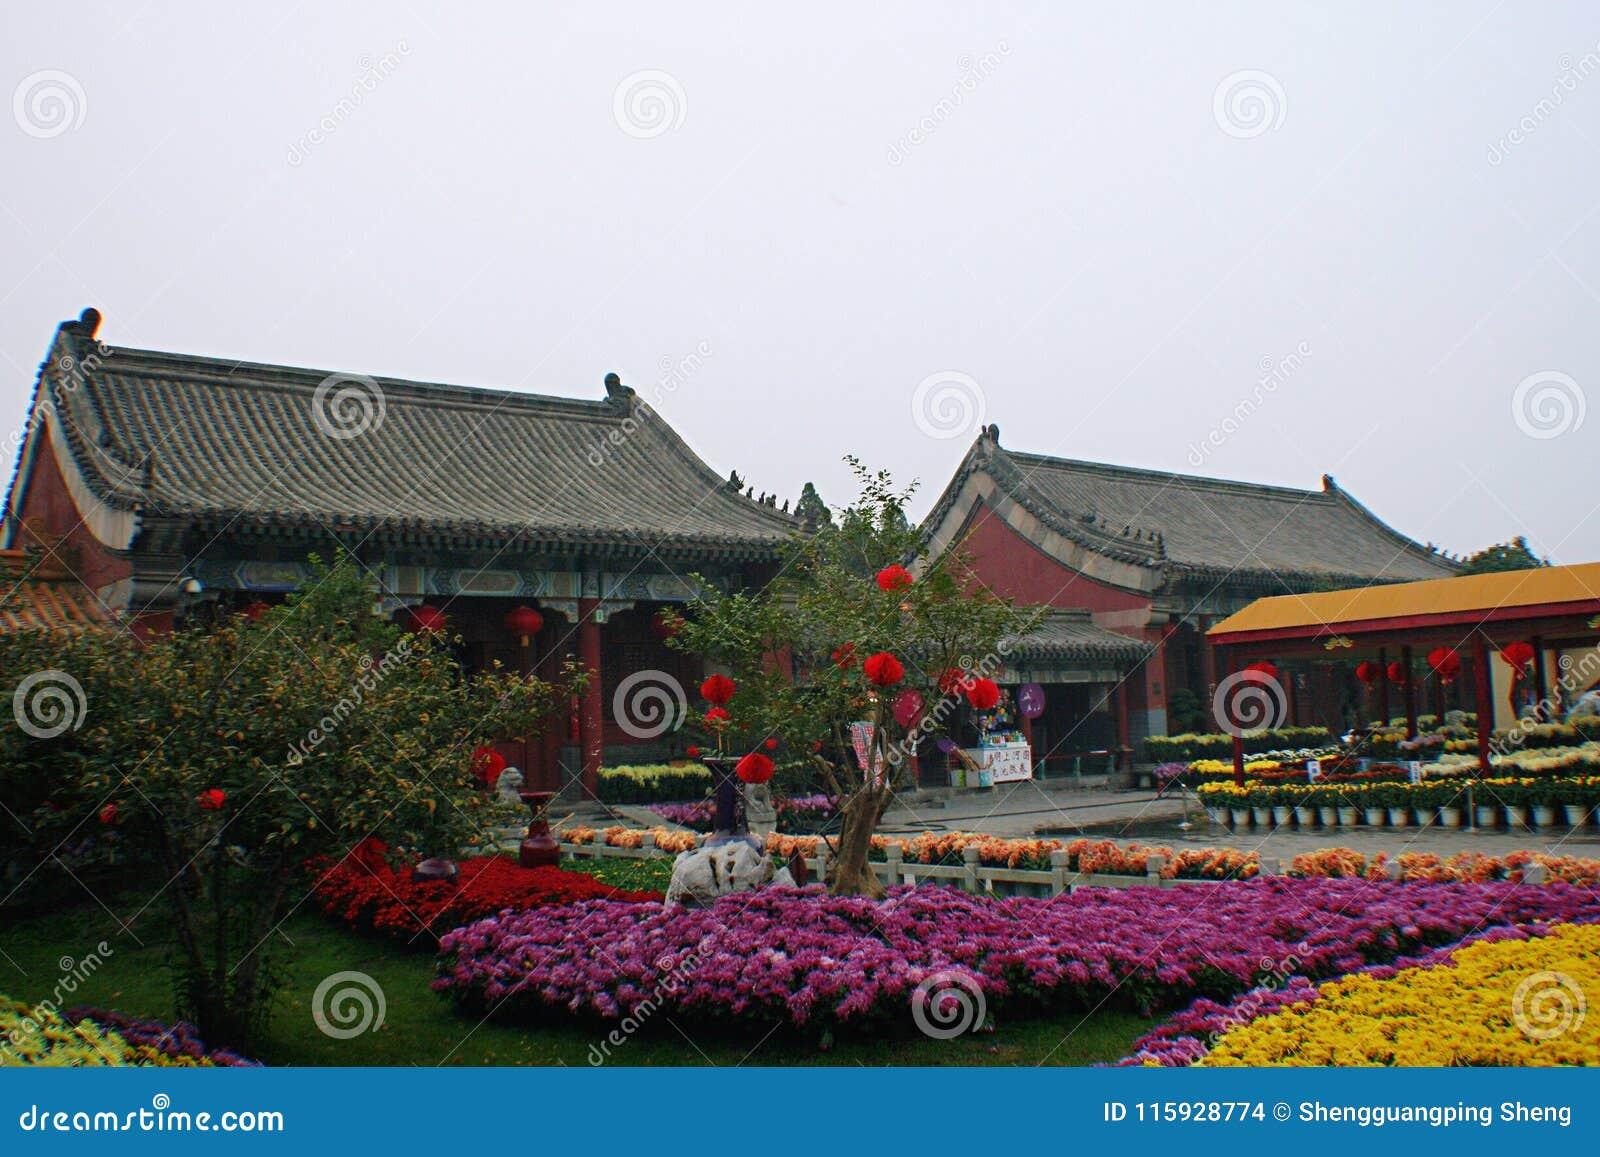 Kaifeng Dragon Pavilion Scenic Area